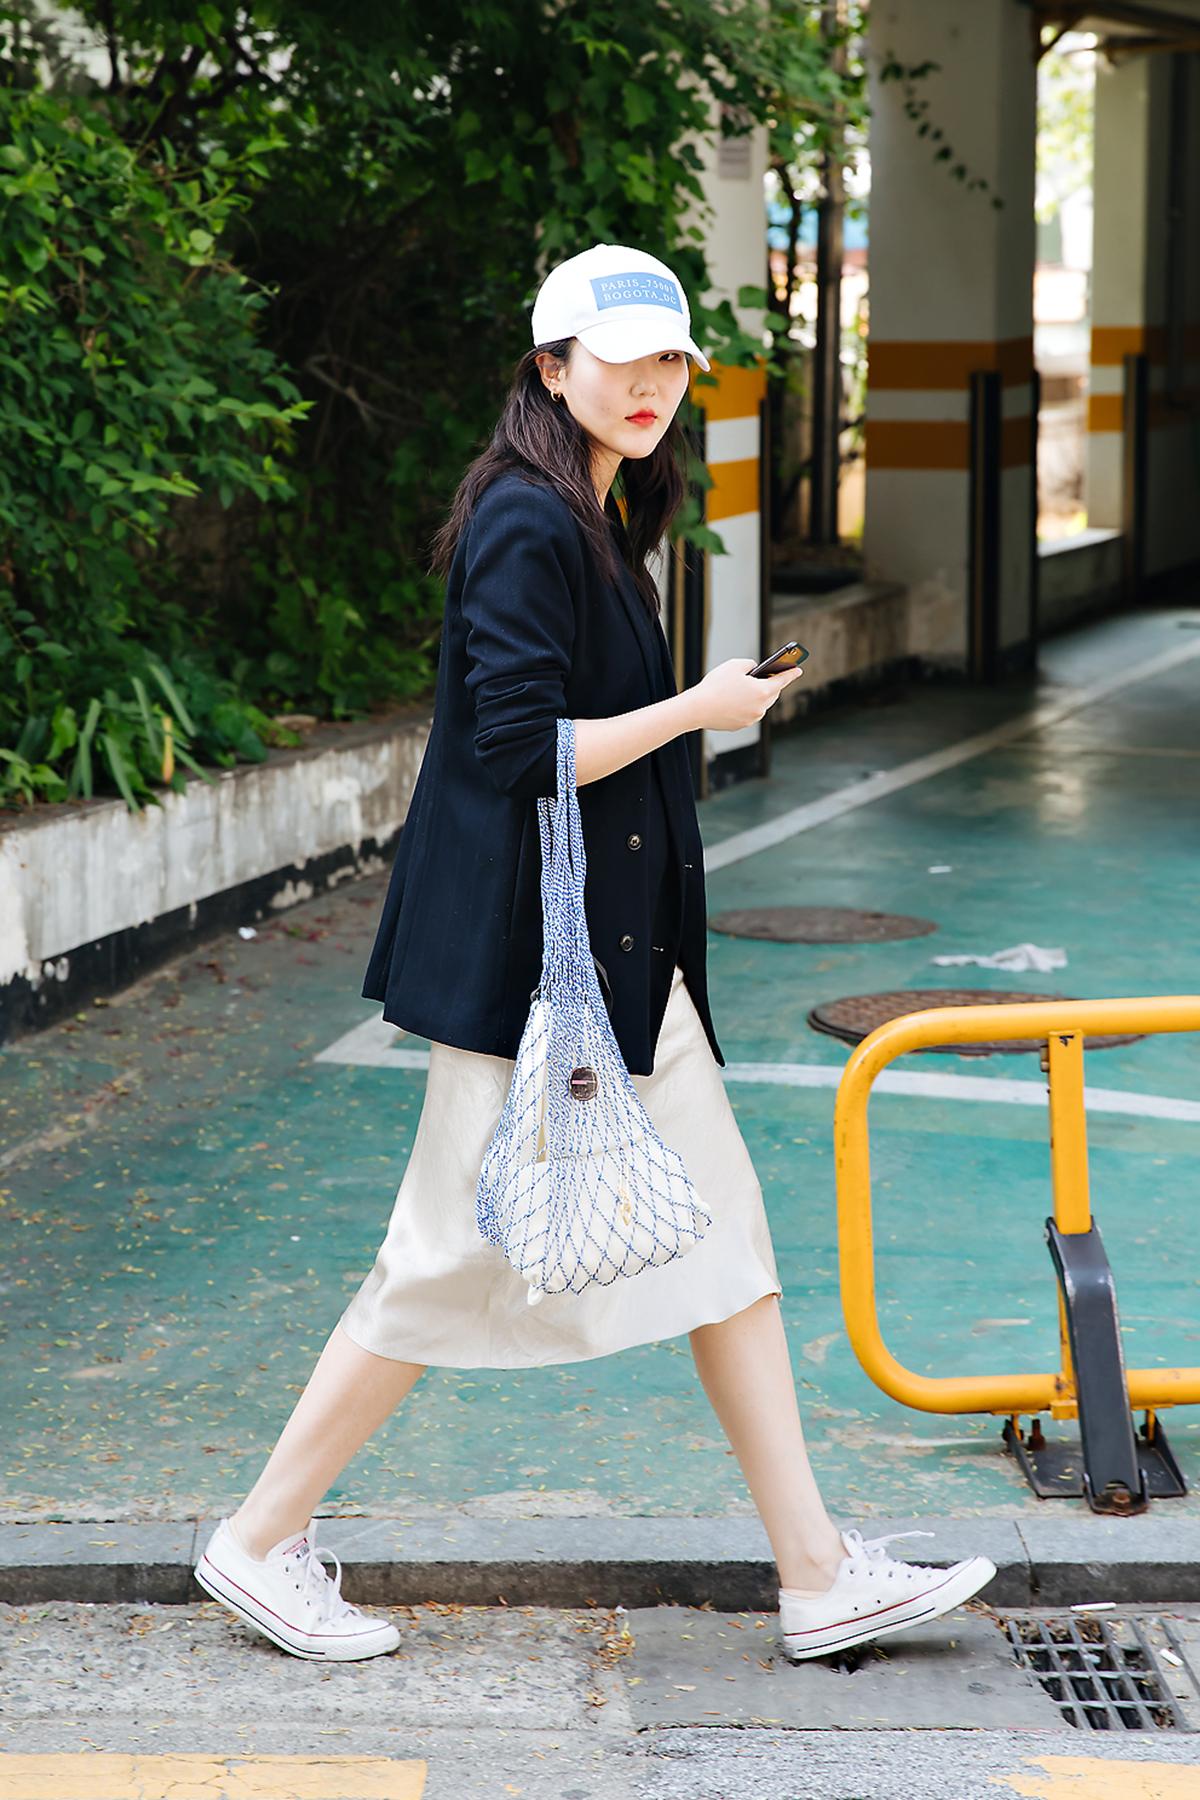 Choi Yoonjung, Street style women spring 2018 in seoul